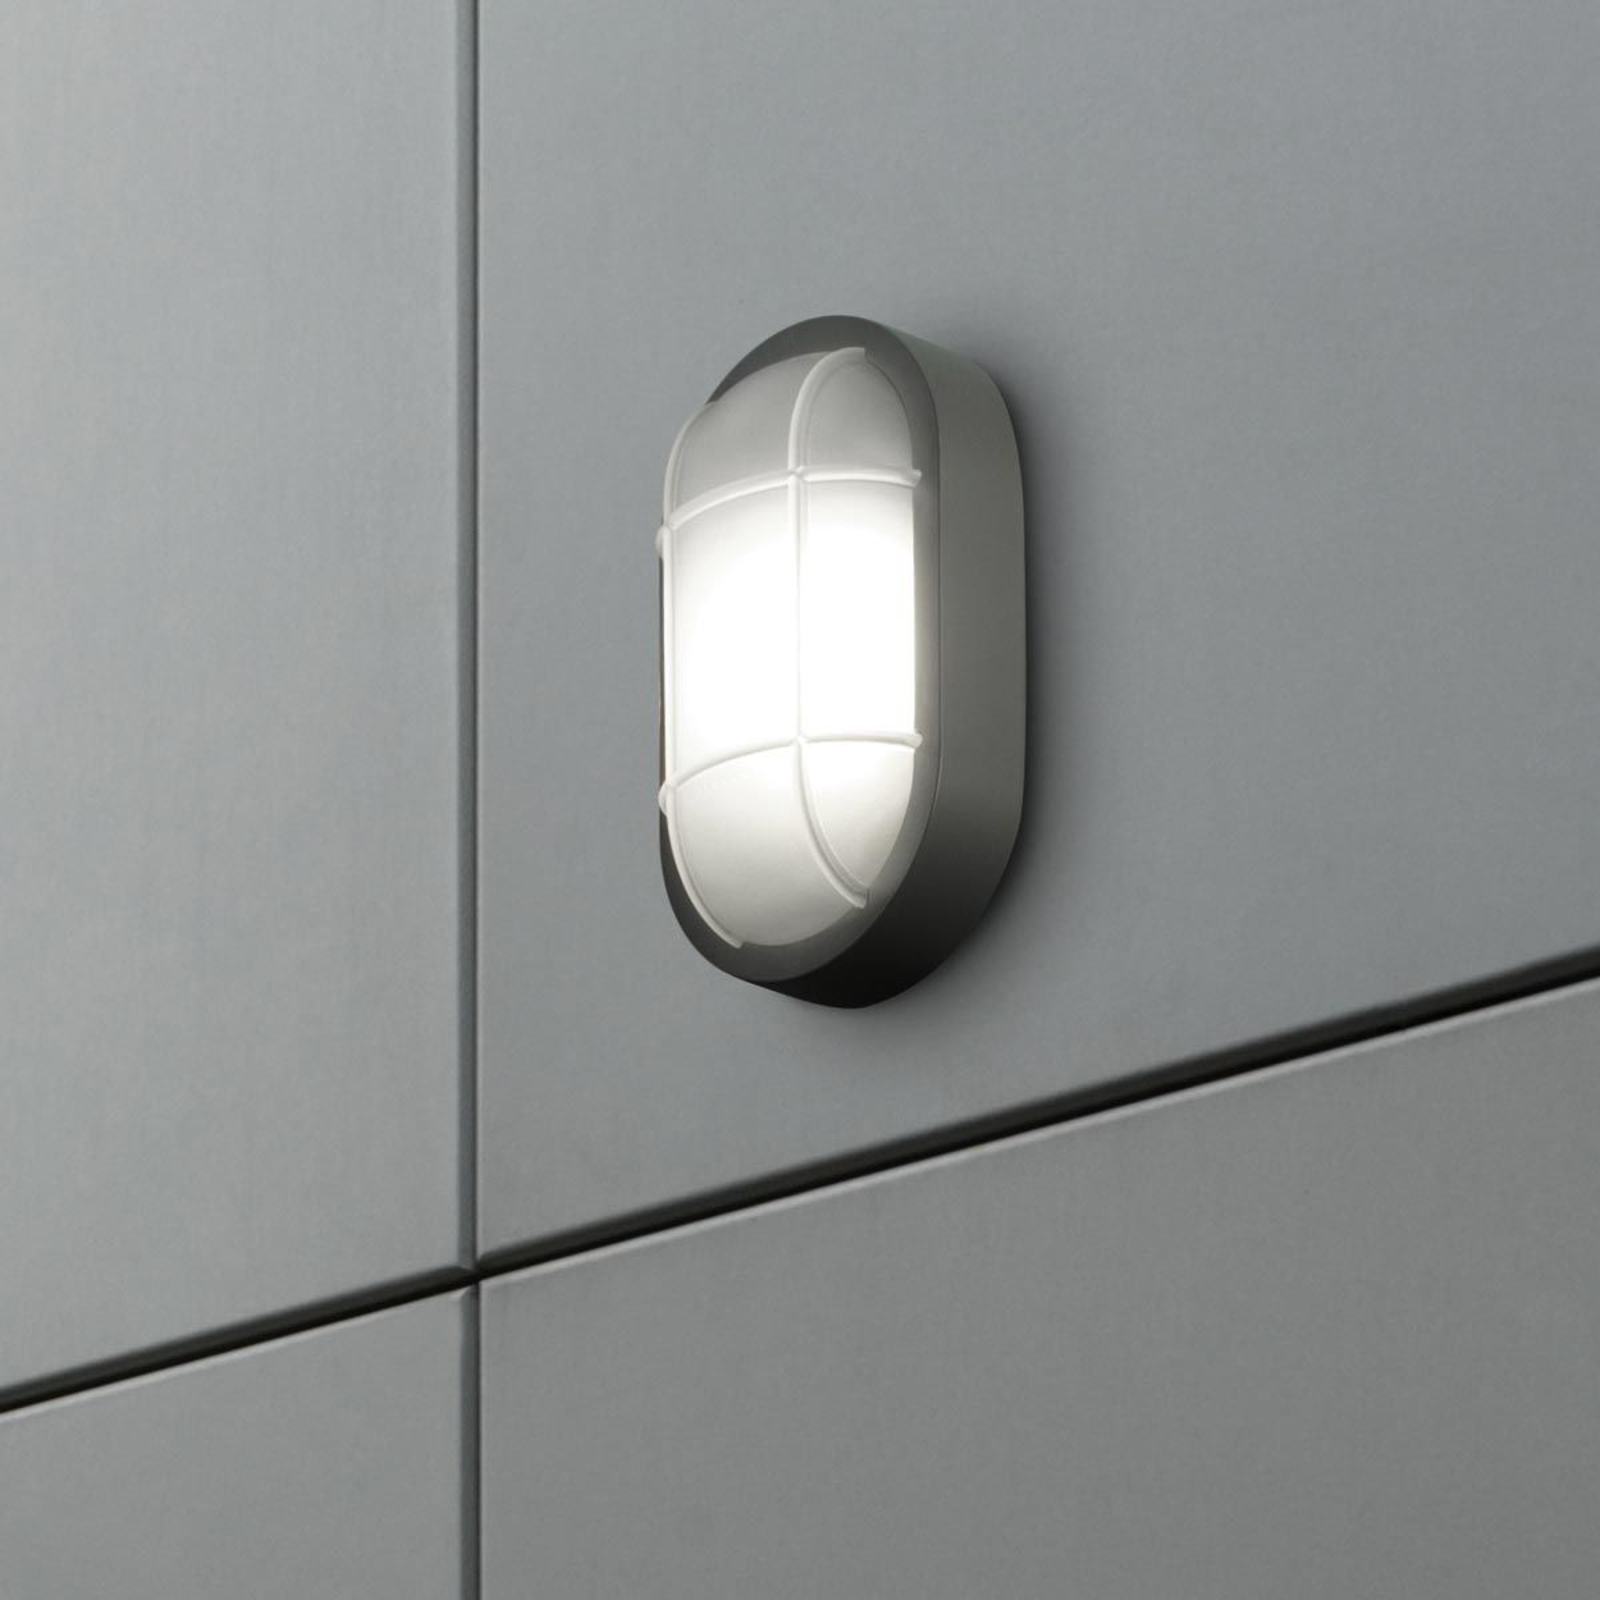 LED bulkhead outdoor wall light Turtled_6025626_1